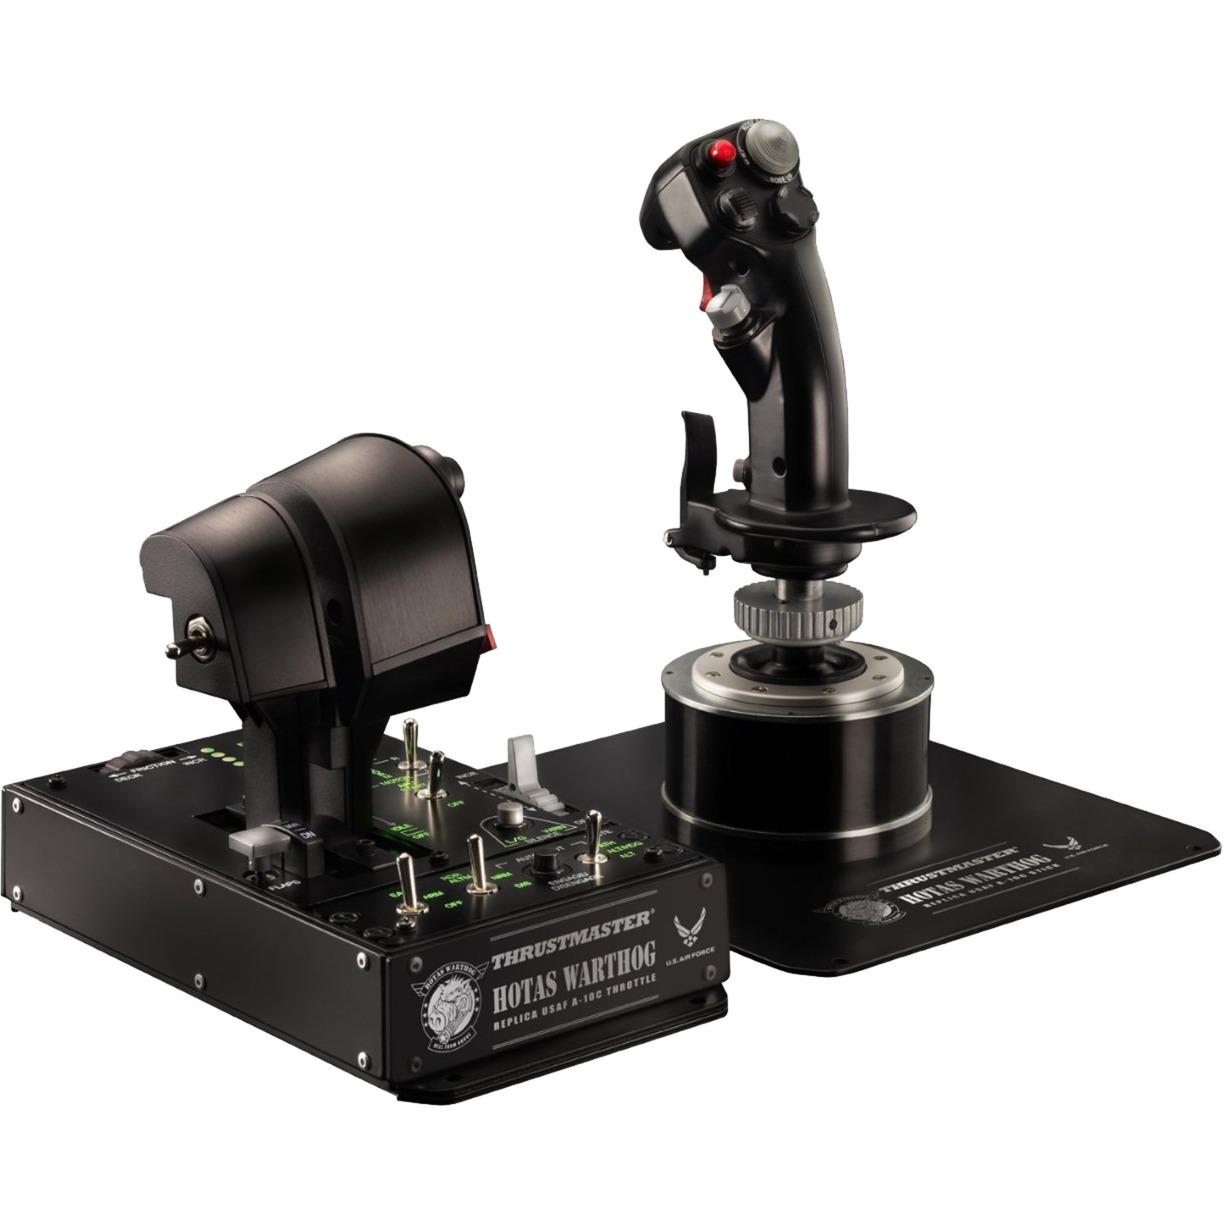 hotas-warthog-joystick-pcplaystation-3-sort